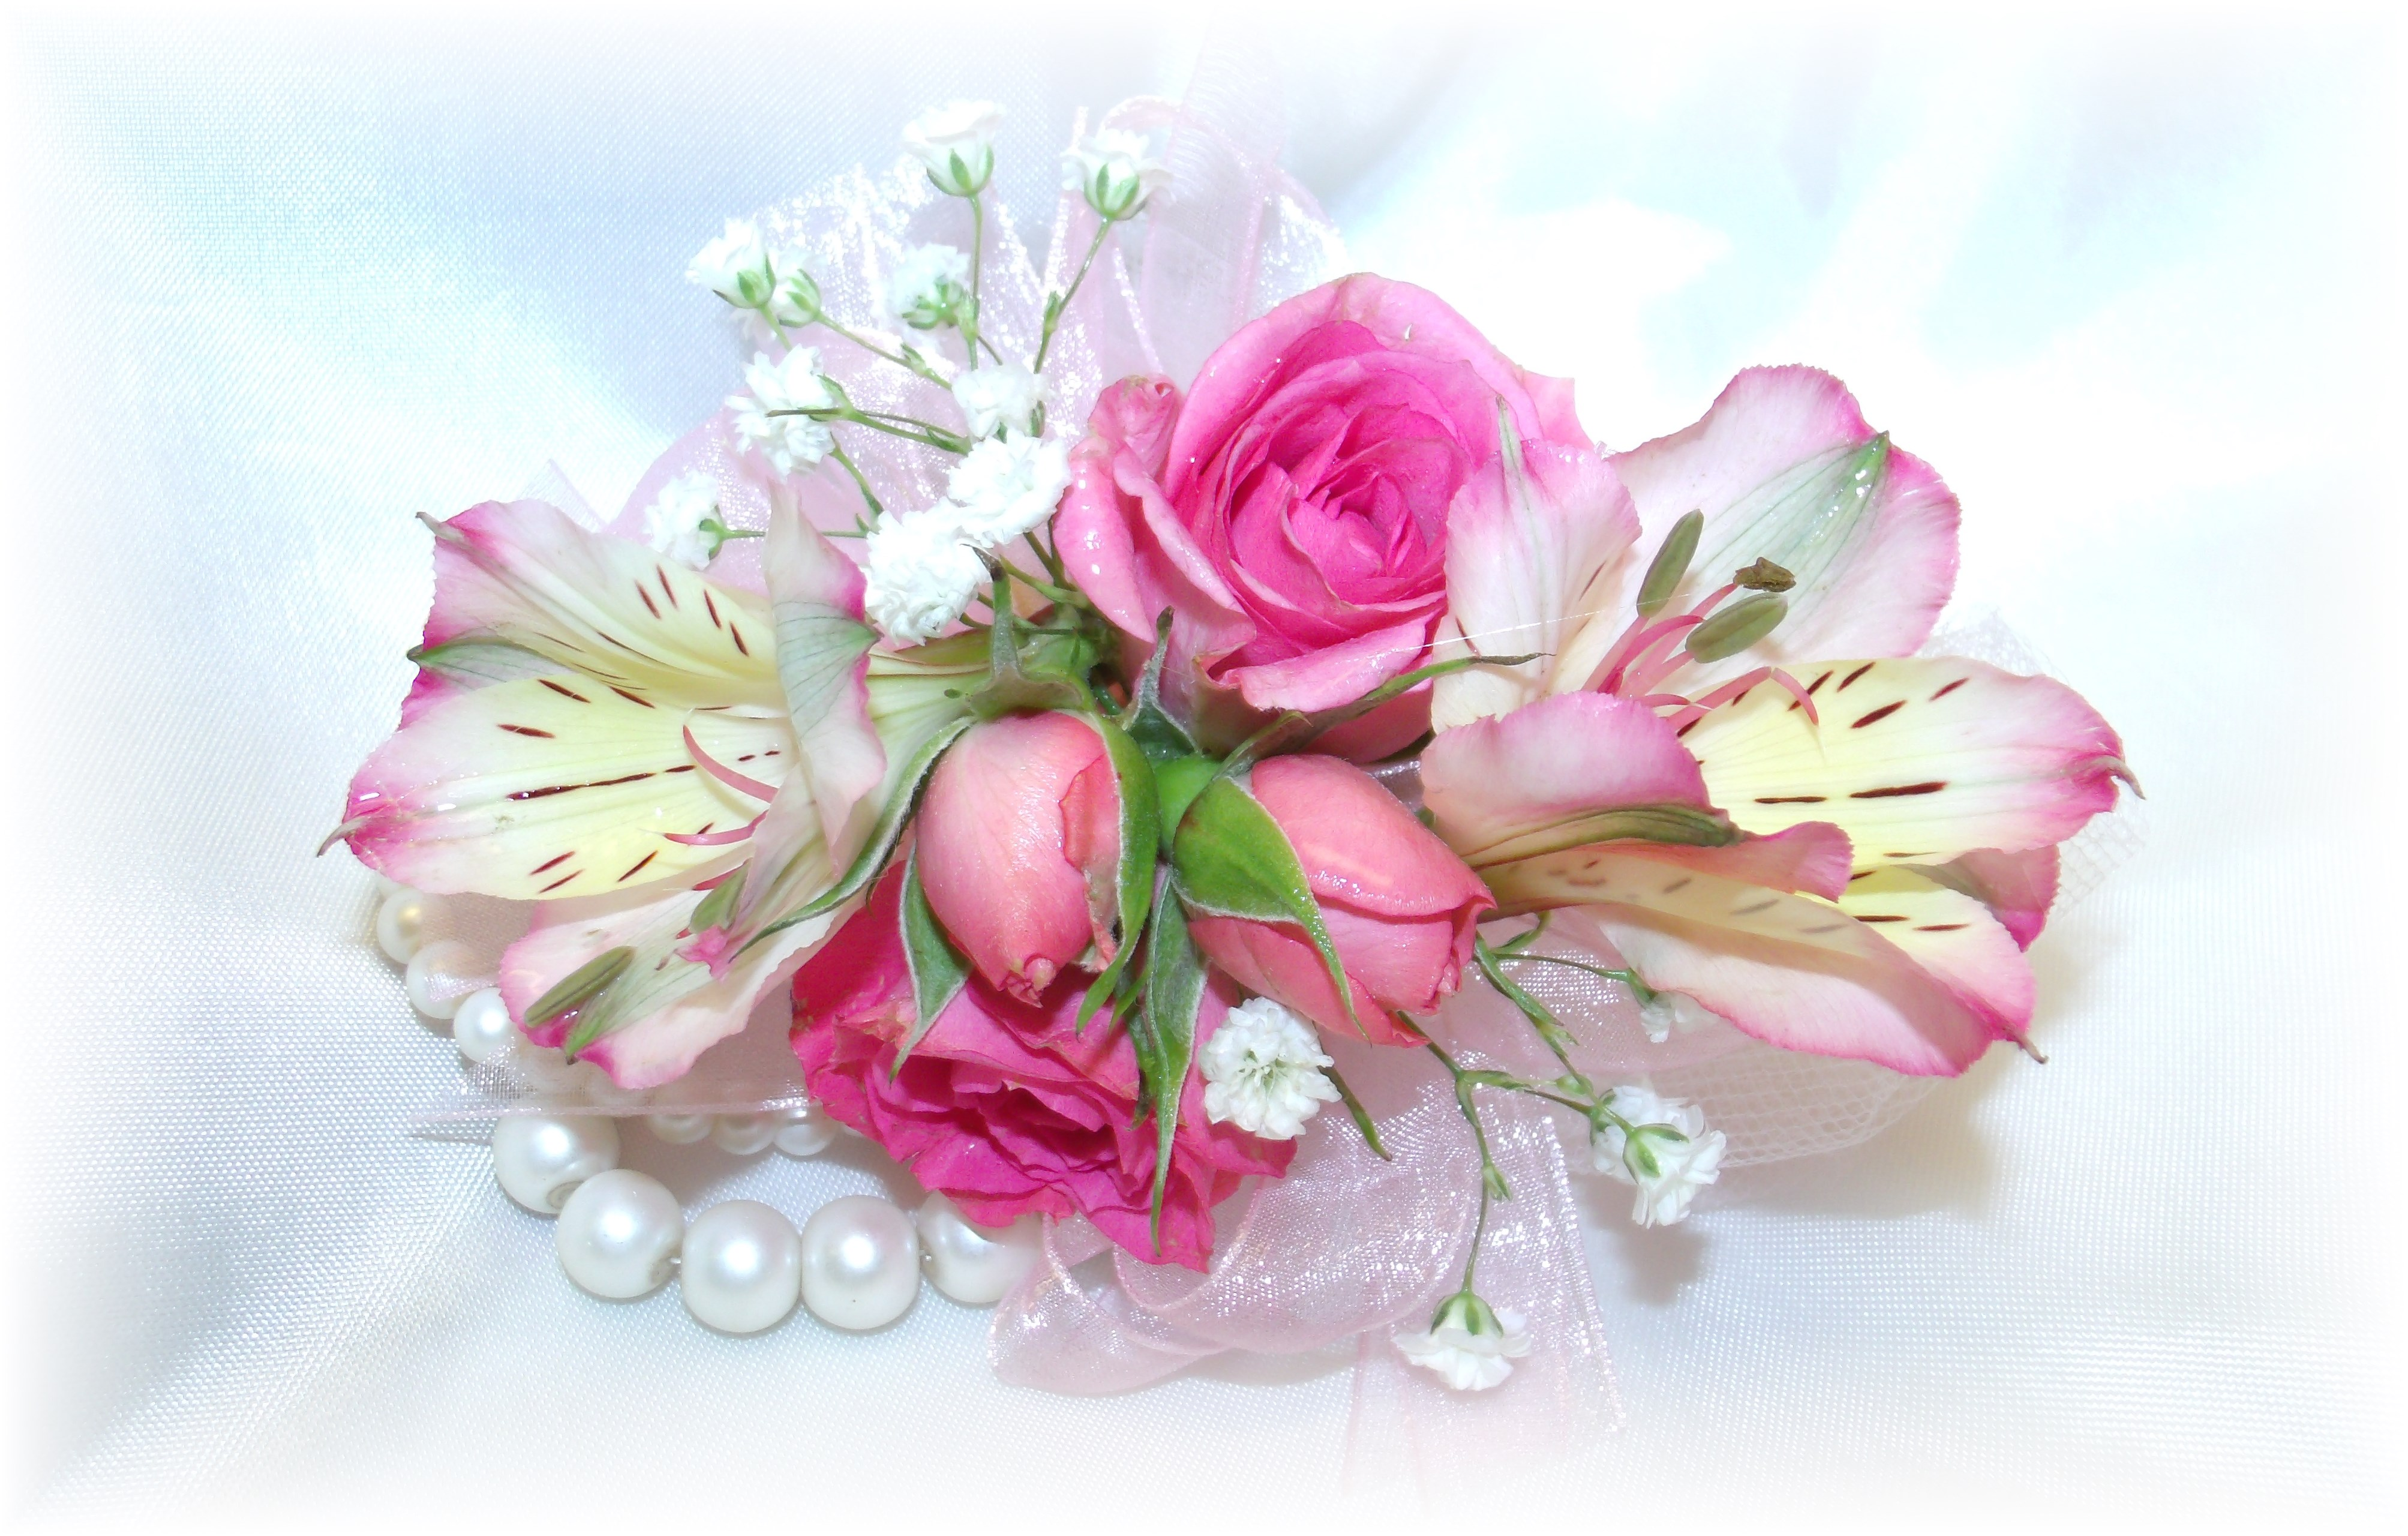 Rose & alstroemeria wristlet corsage